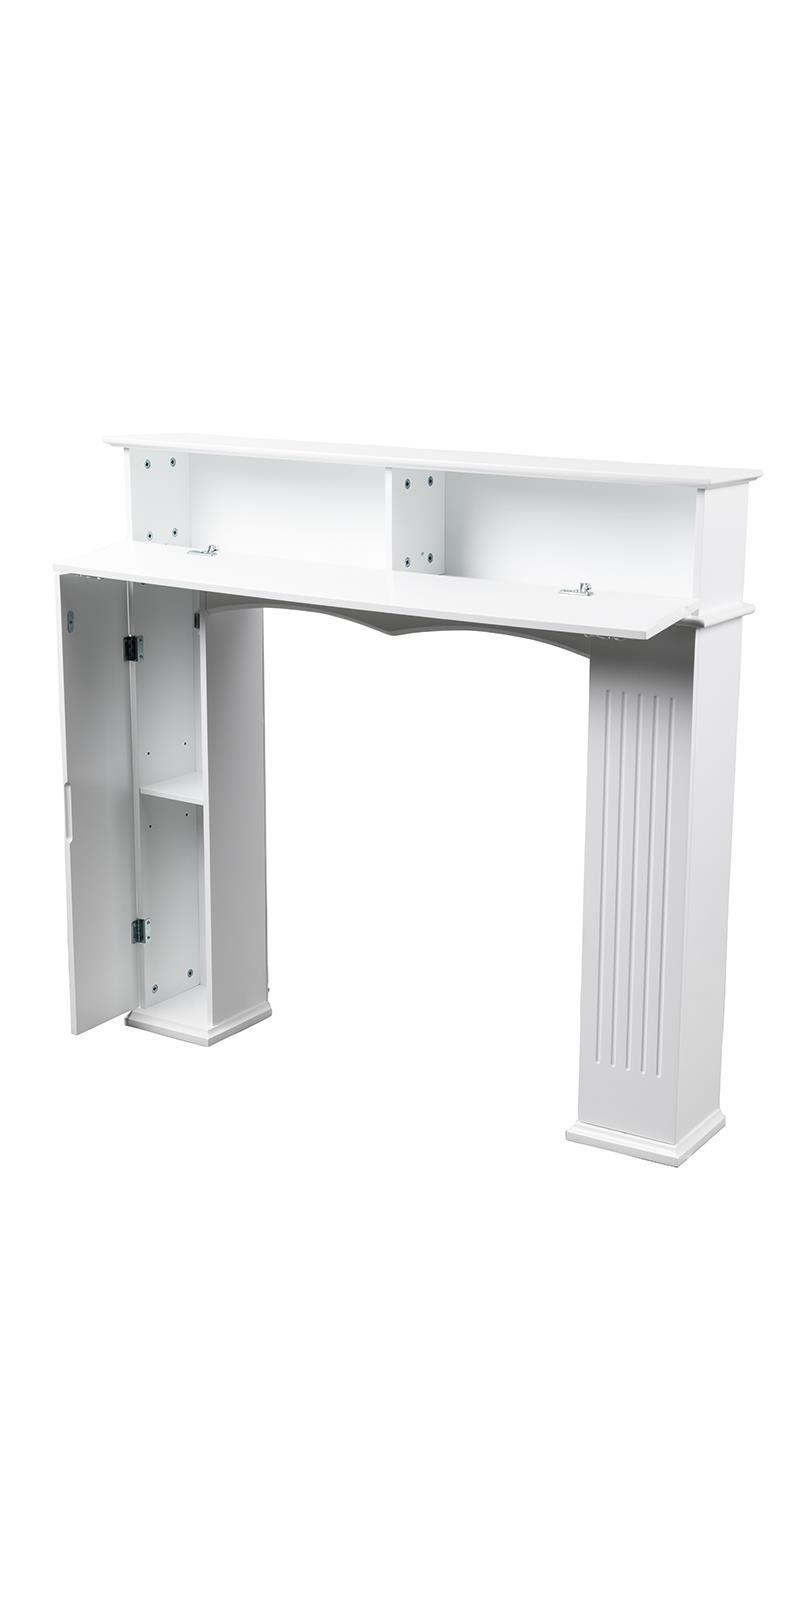 Kaminkonsole Weiß 107 x 100 x 18cm Kaminverkleidung Dekokamin Kaminsims Attrappe